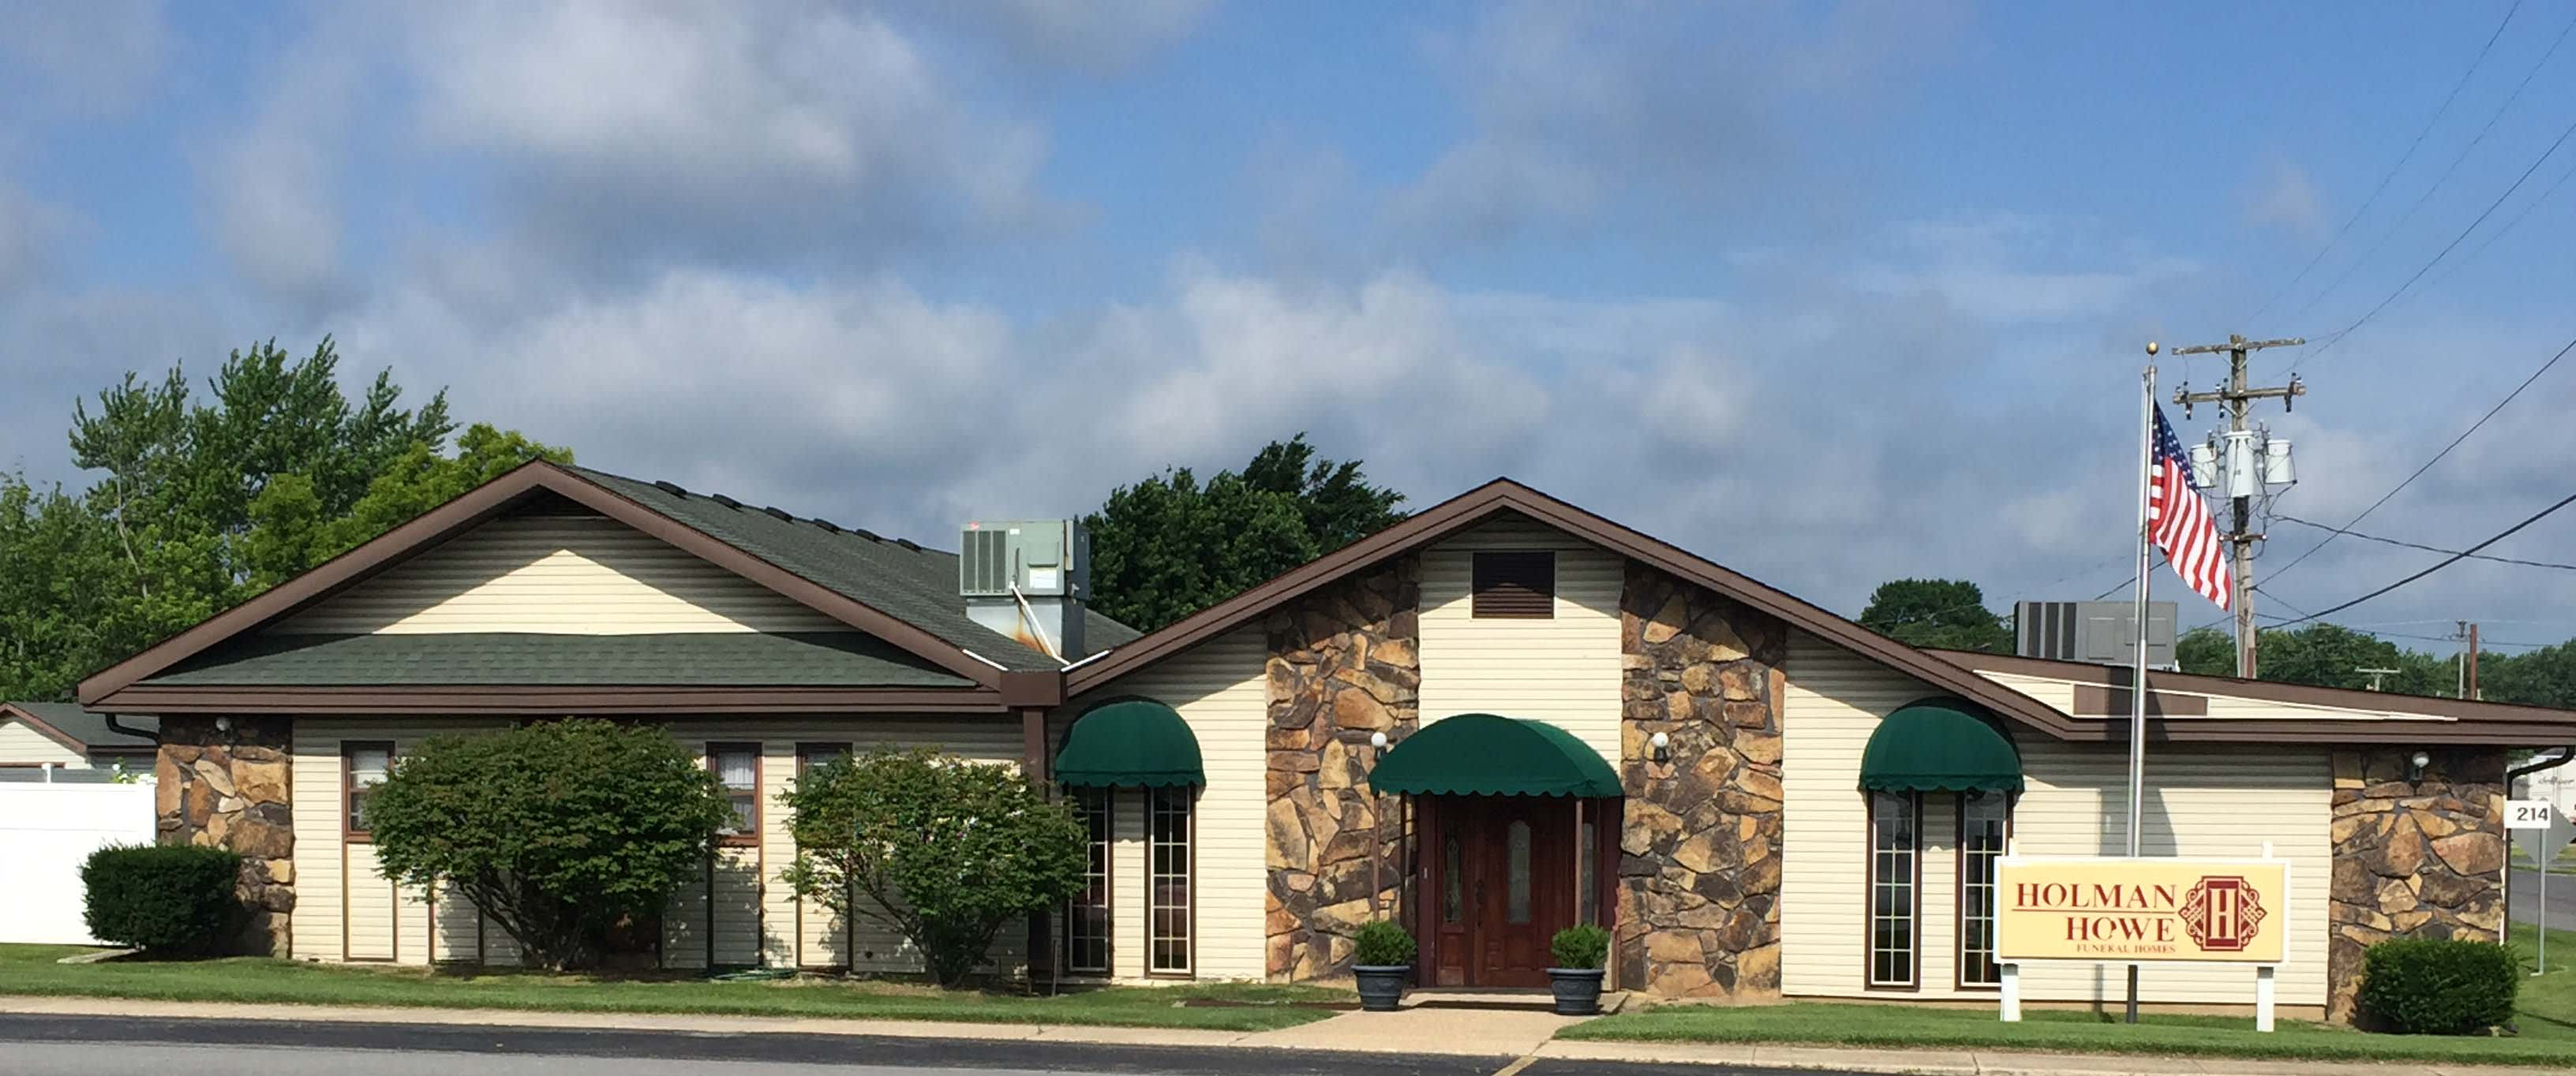 Obituary - Visitation & Funeral Information